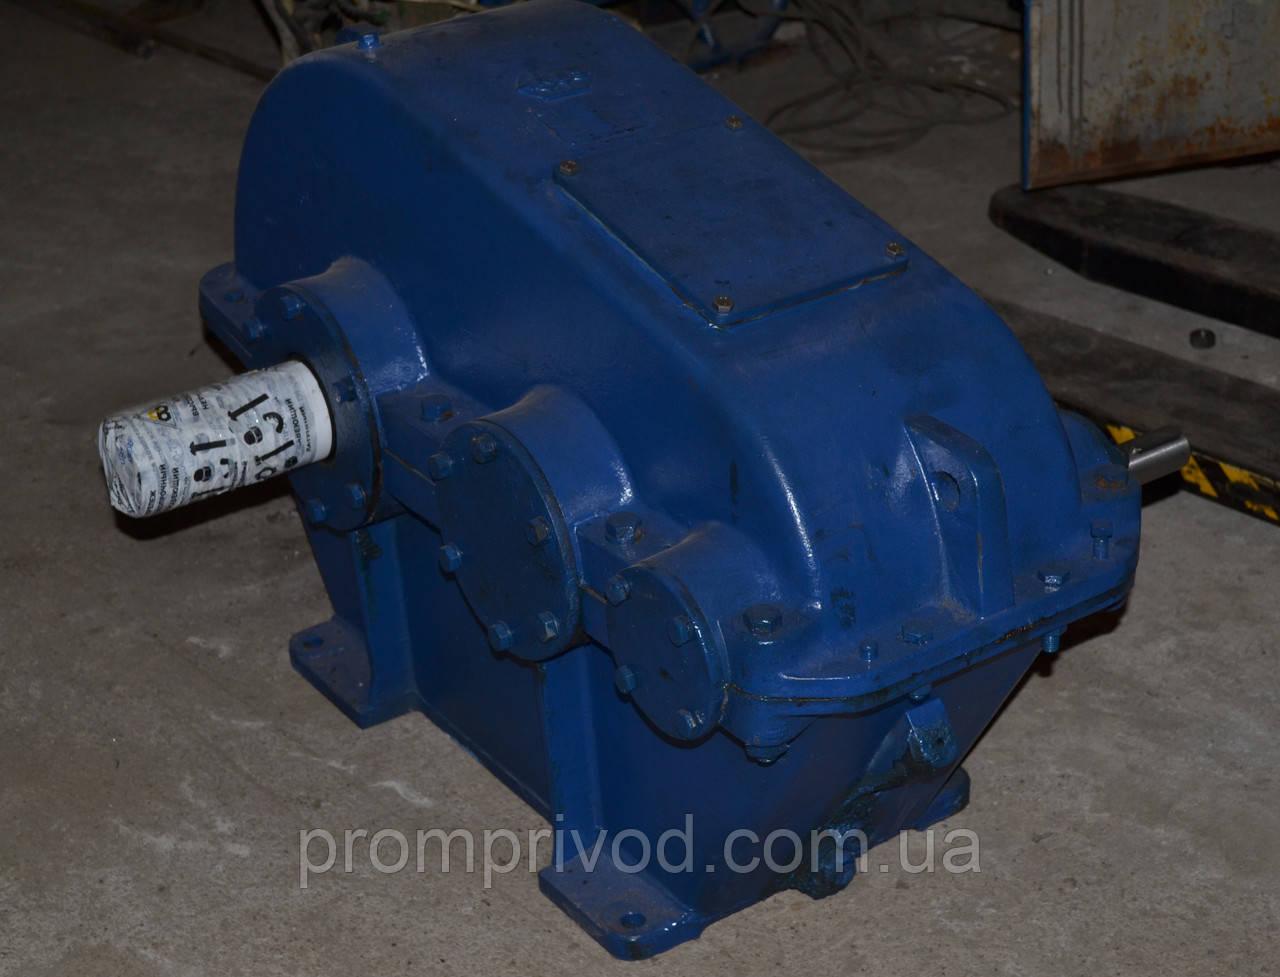 Редуктор РМ-750-16-11